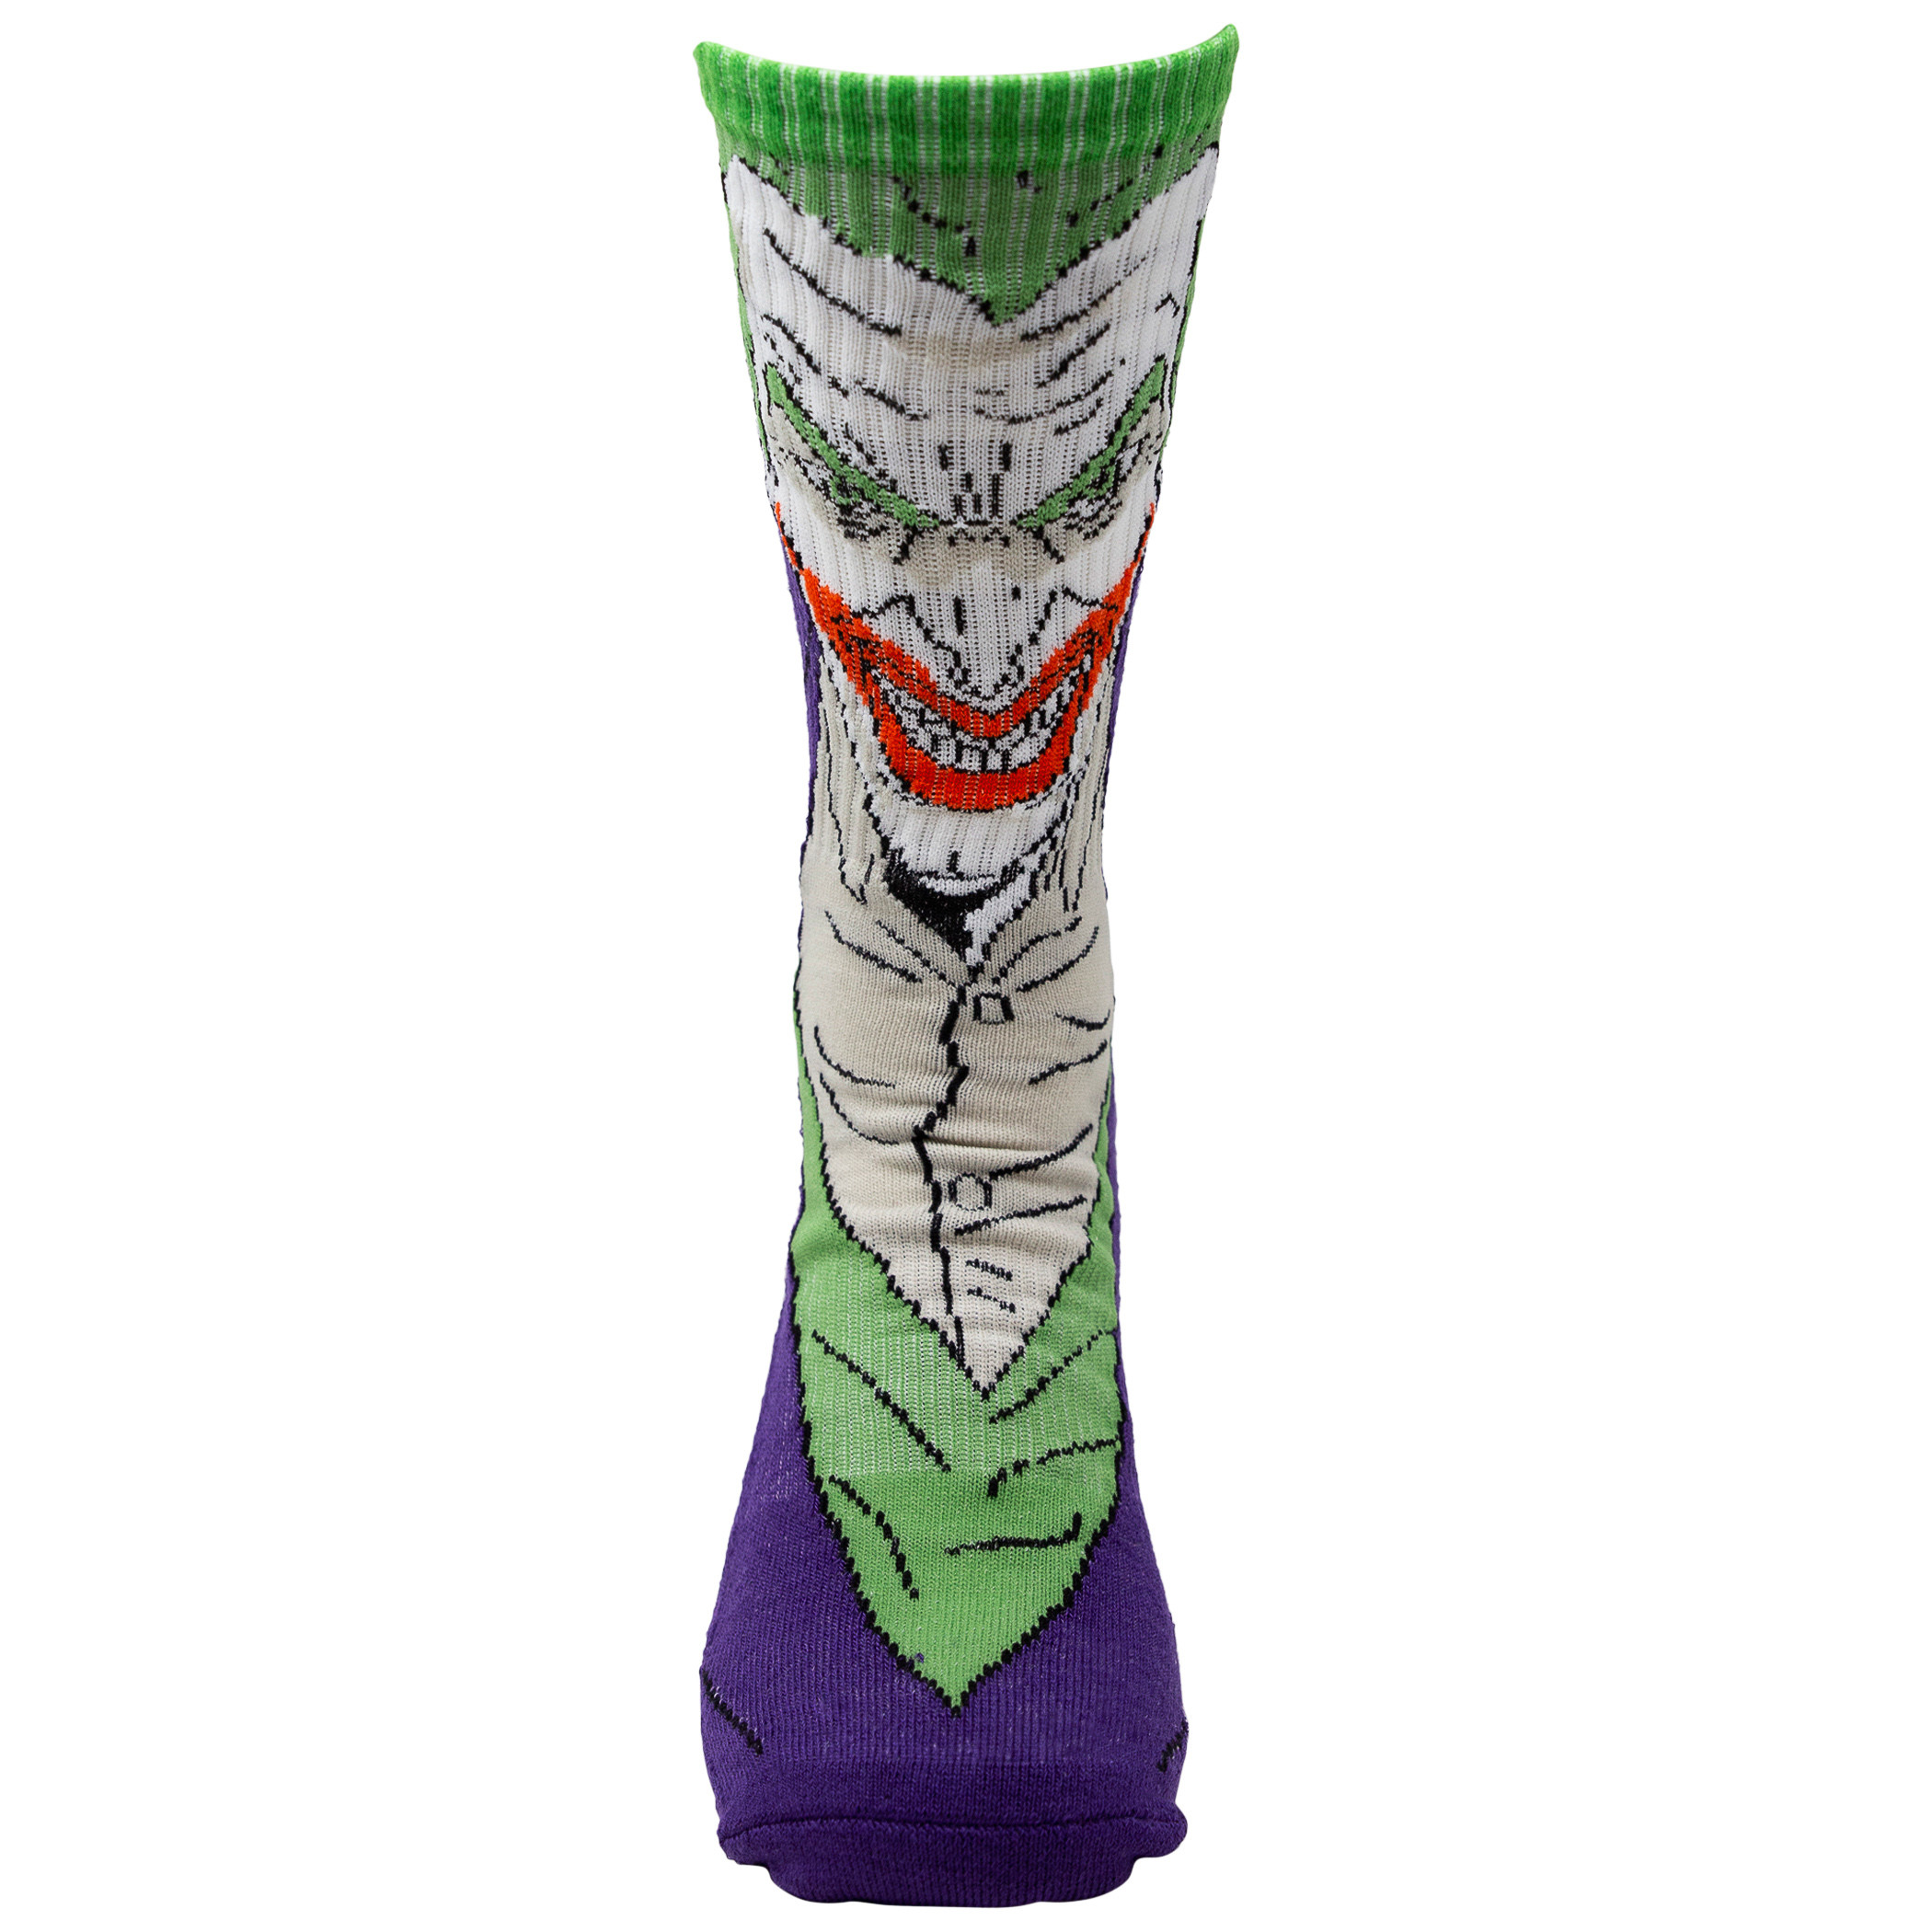 Batman and Joker Character Crew Socks 2-Pair Pack